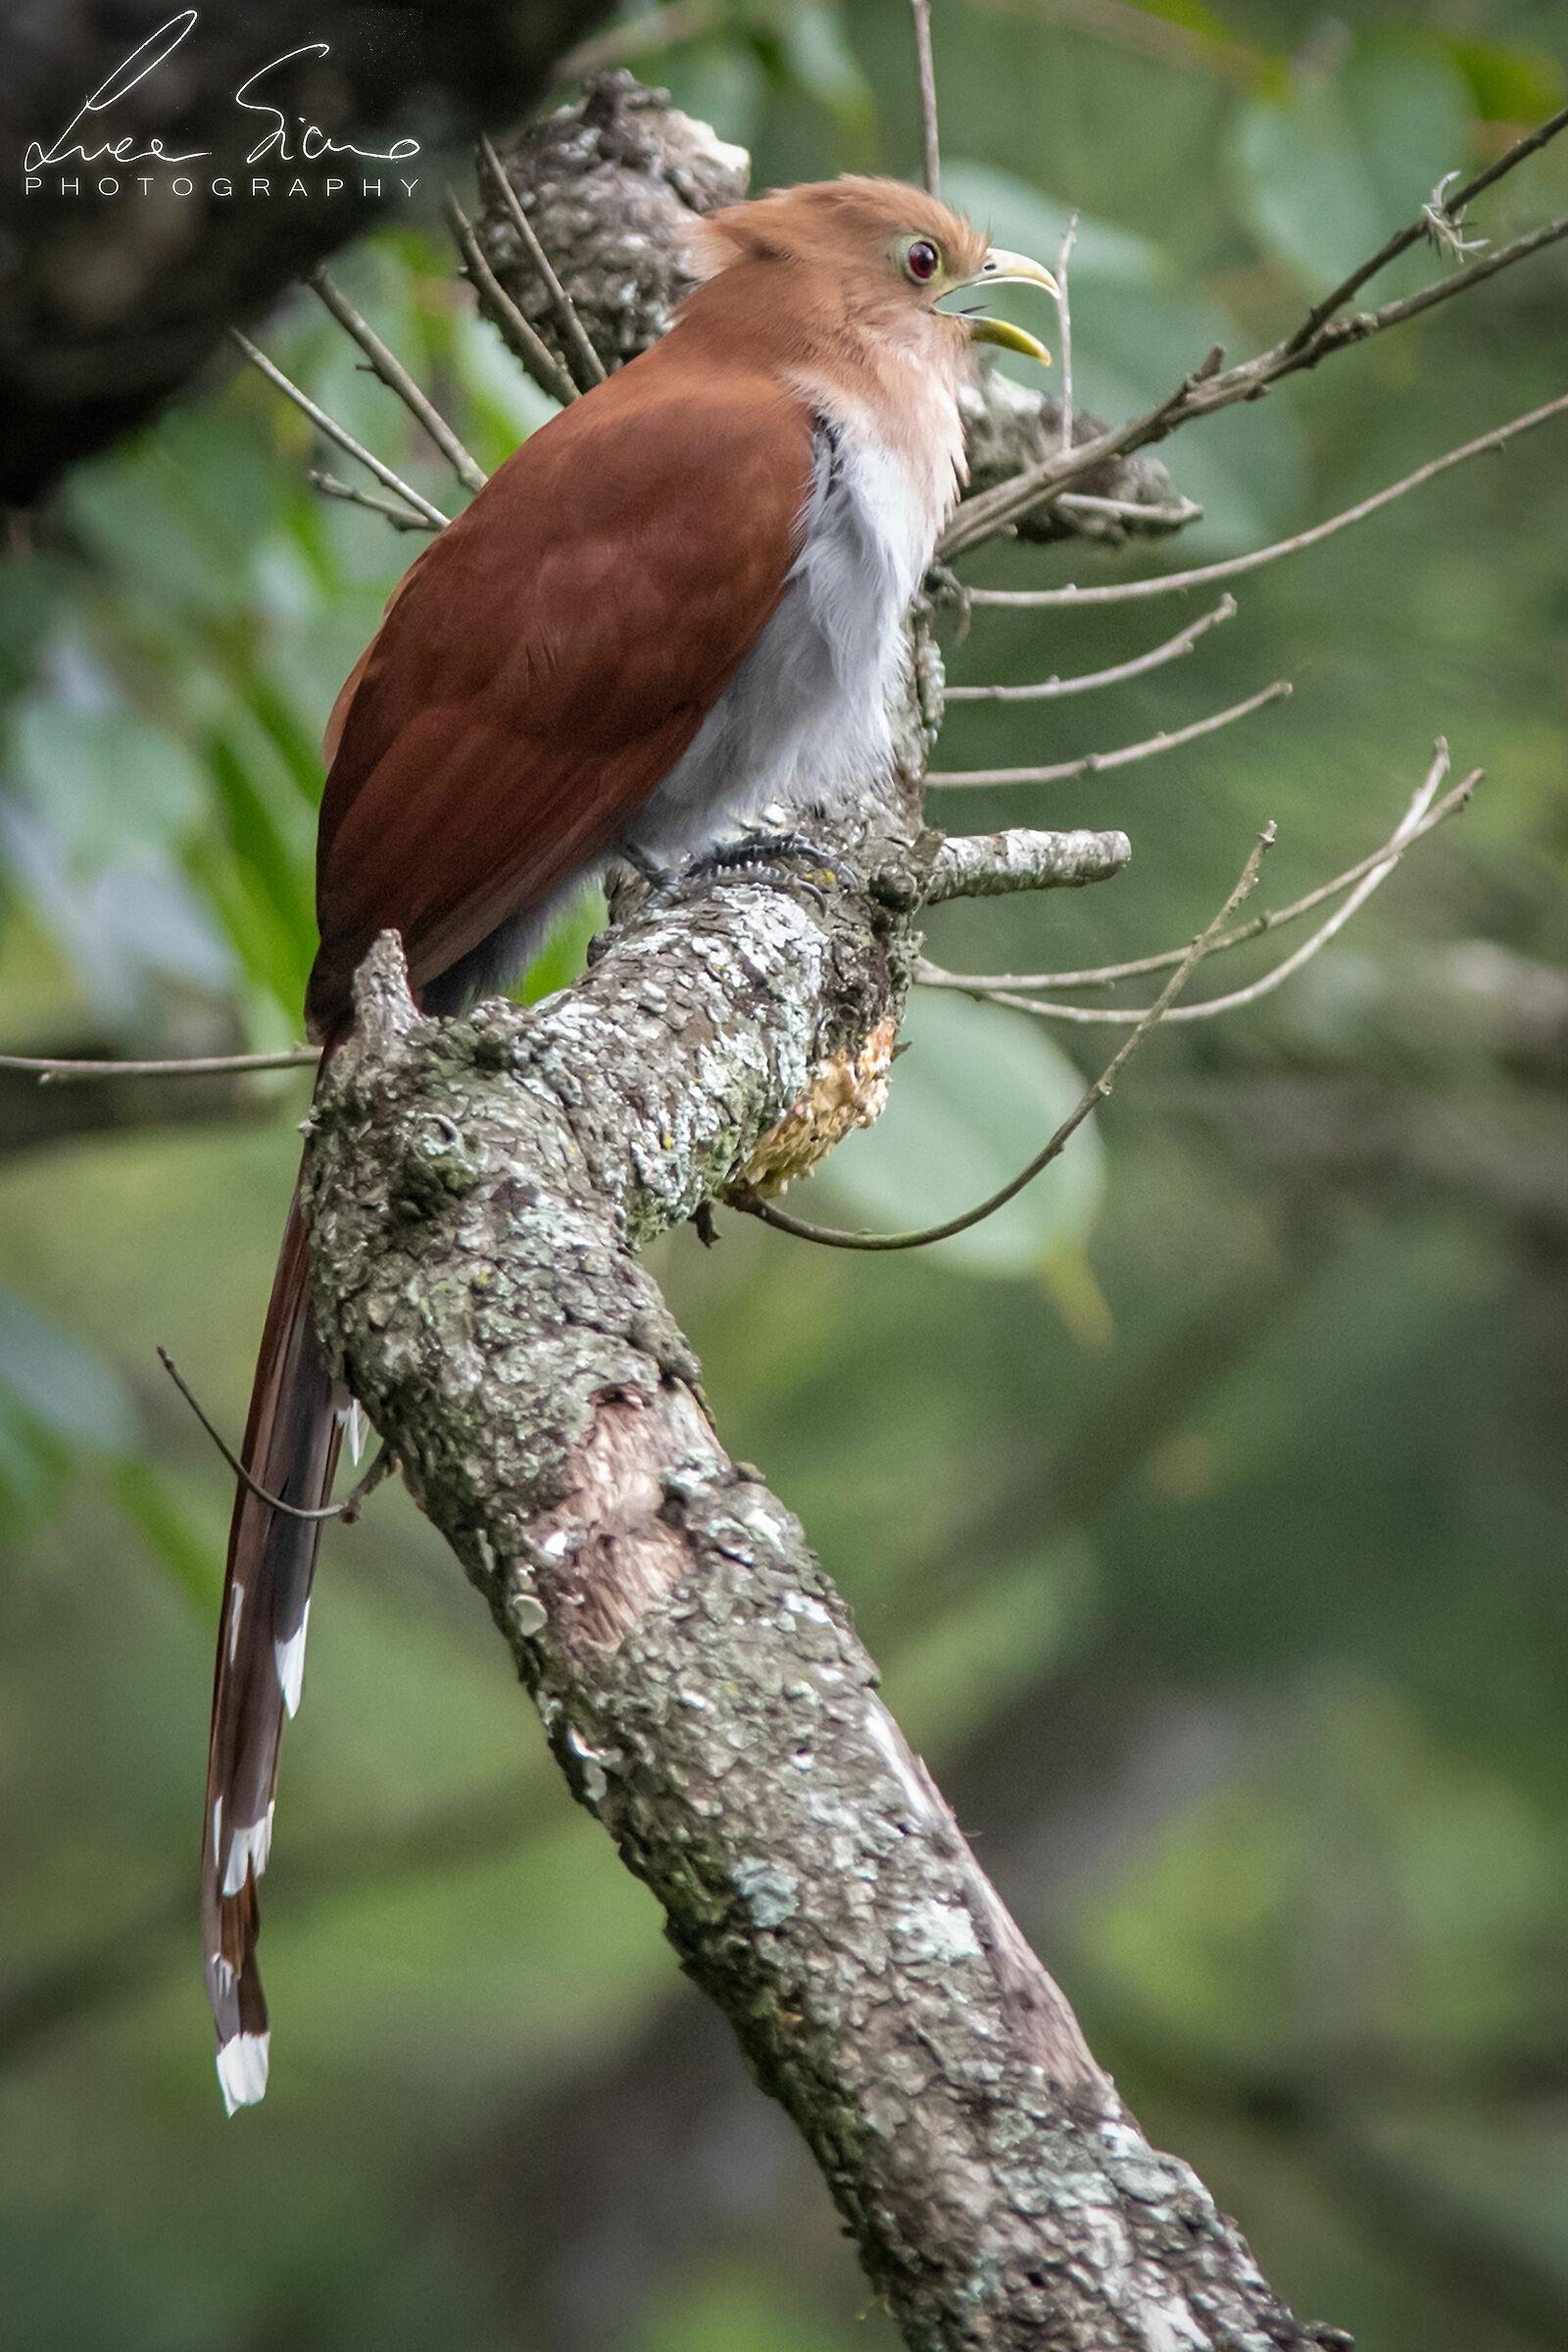 Piaya cayana or Squirrel Cuckoo...